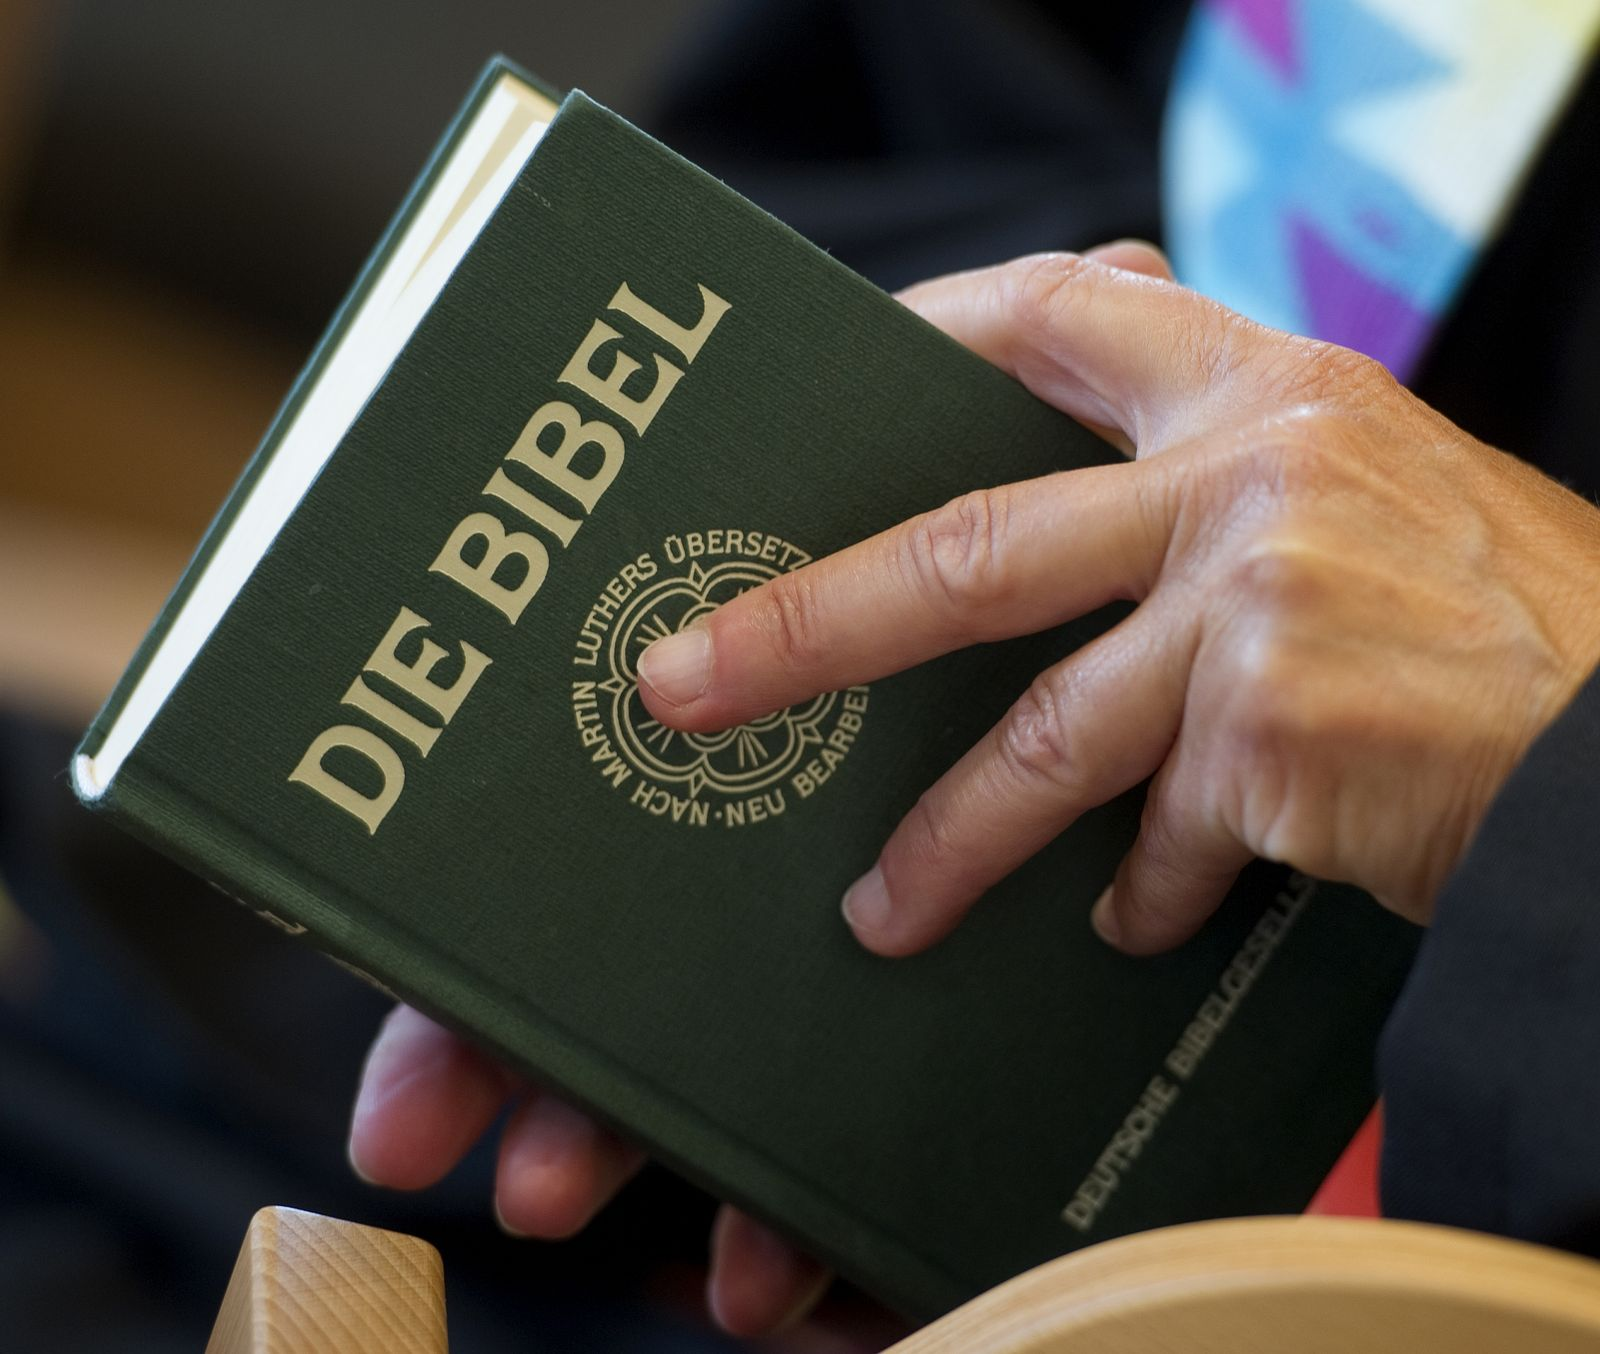 Symbolbild / Glauben / Religion / Bibel / Christentum